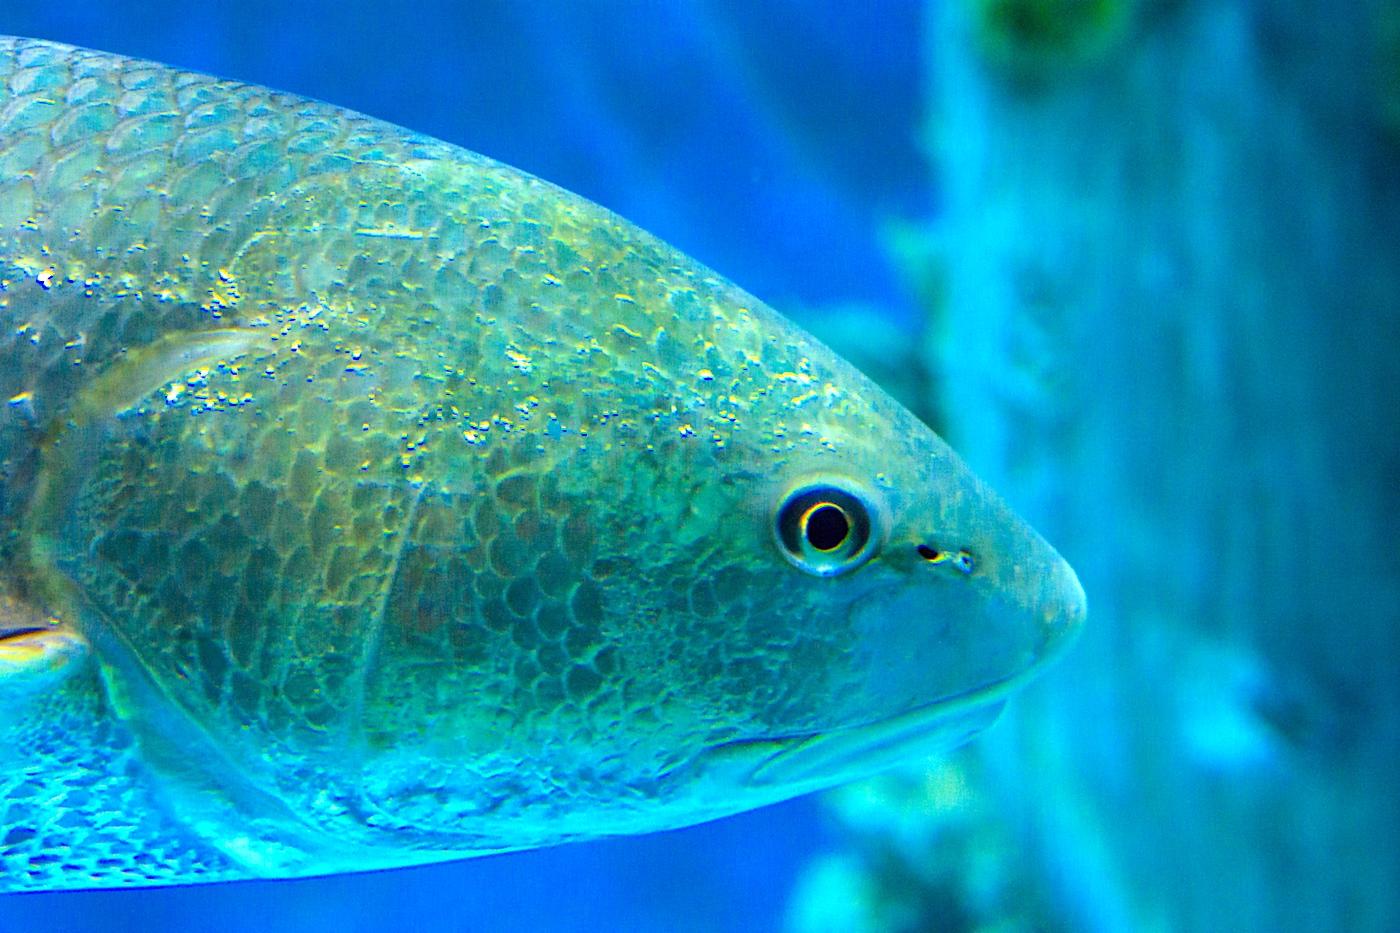 Redfish underwater in a large fishtank.